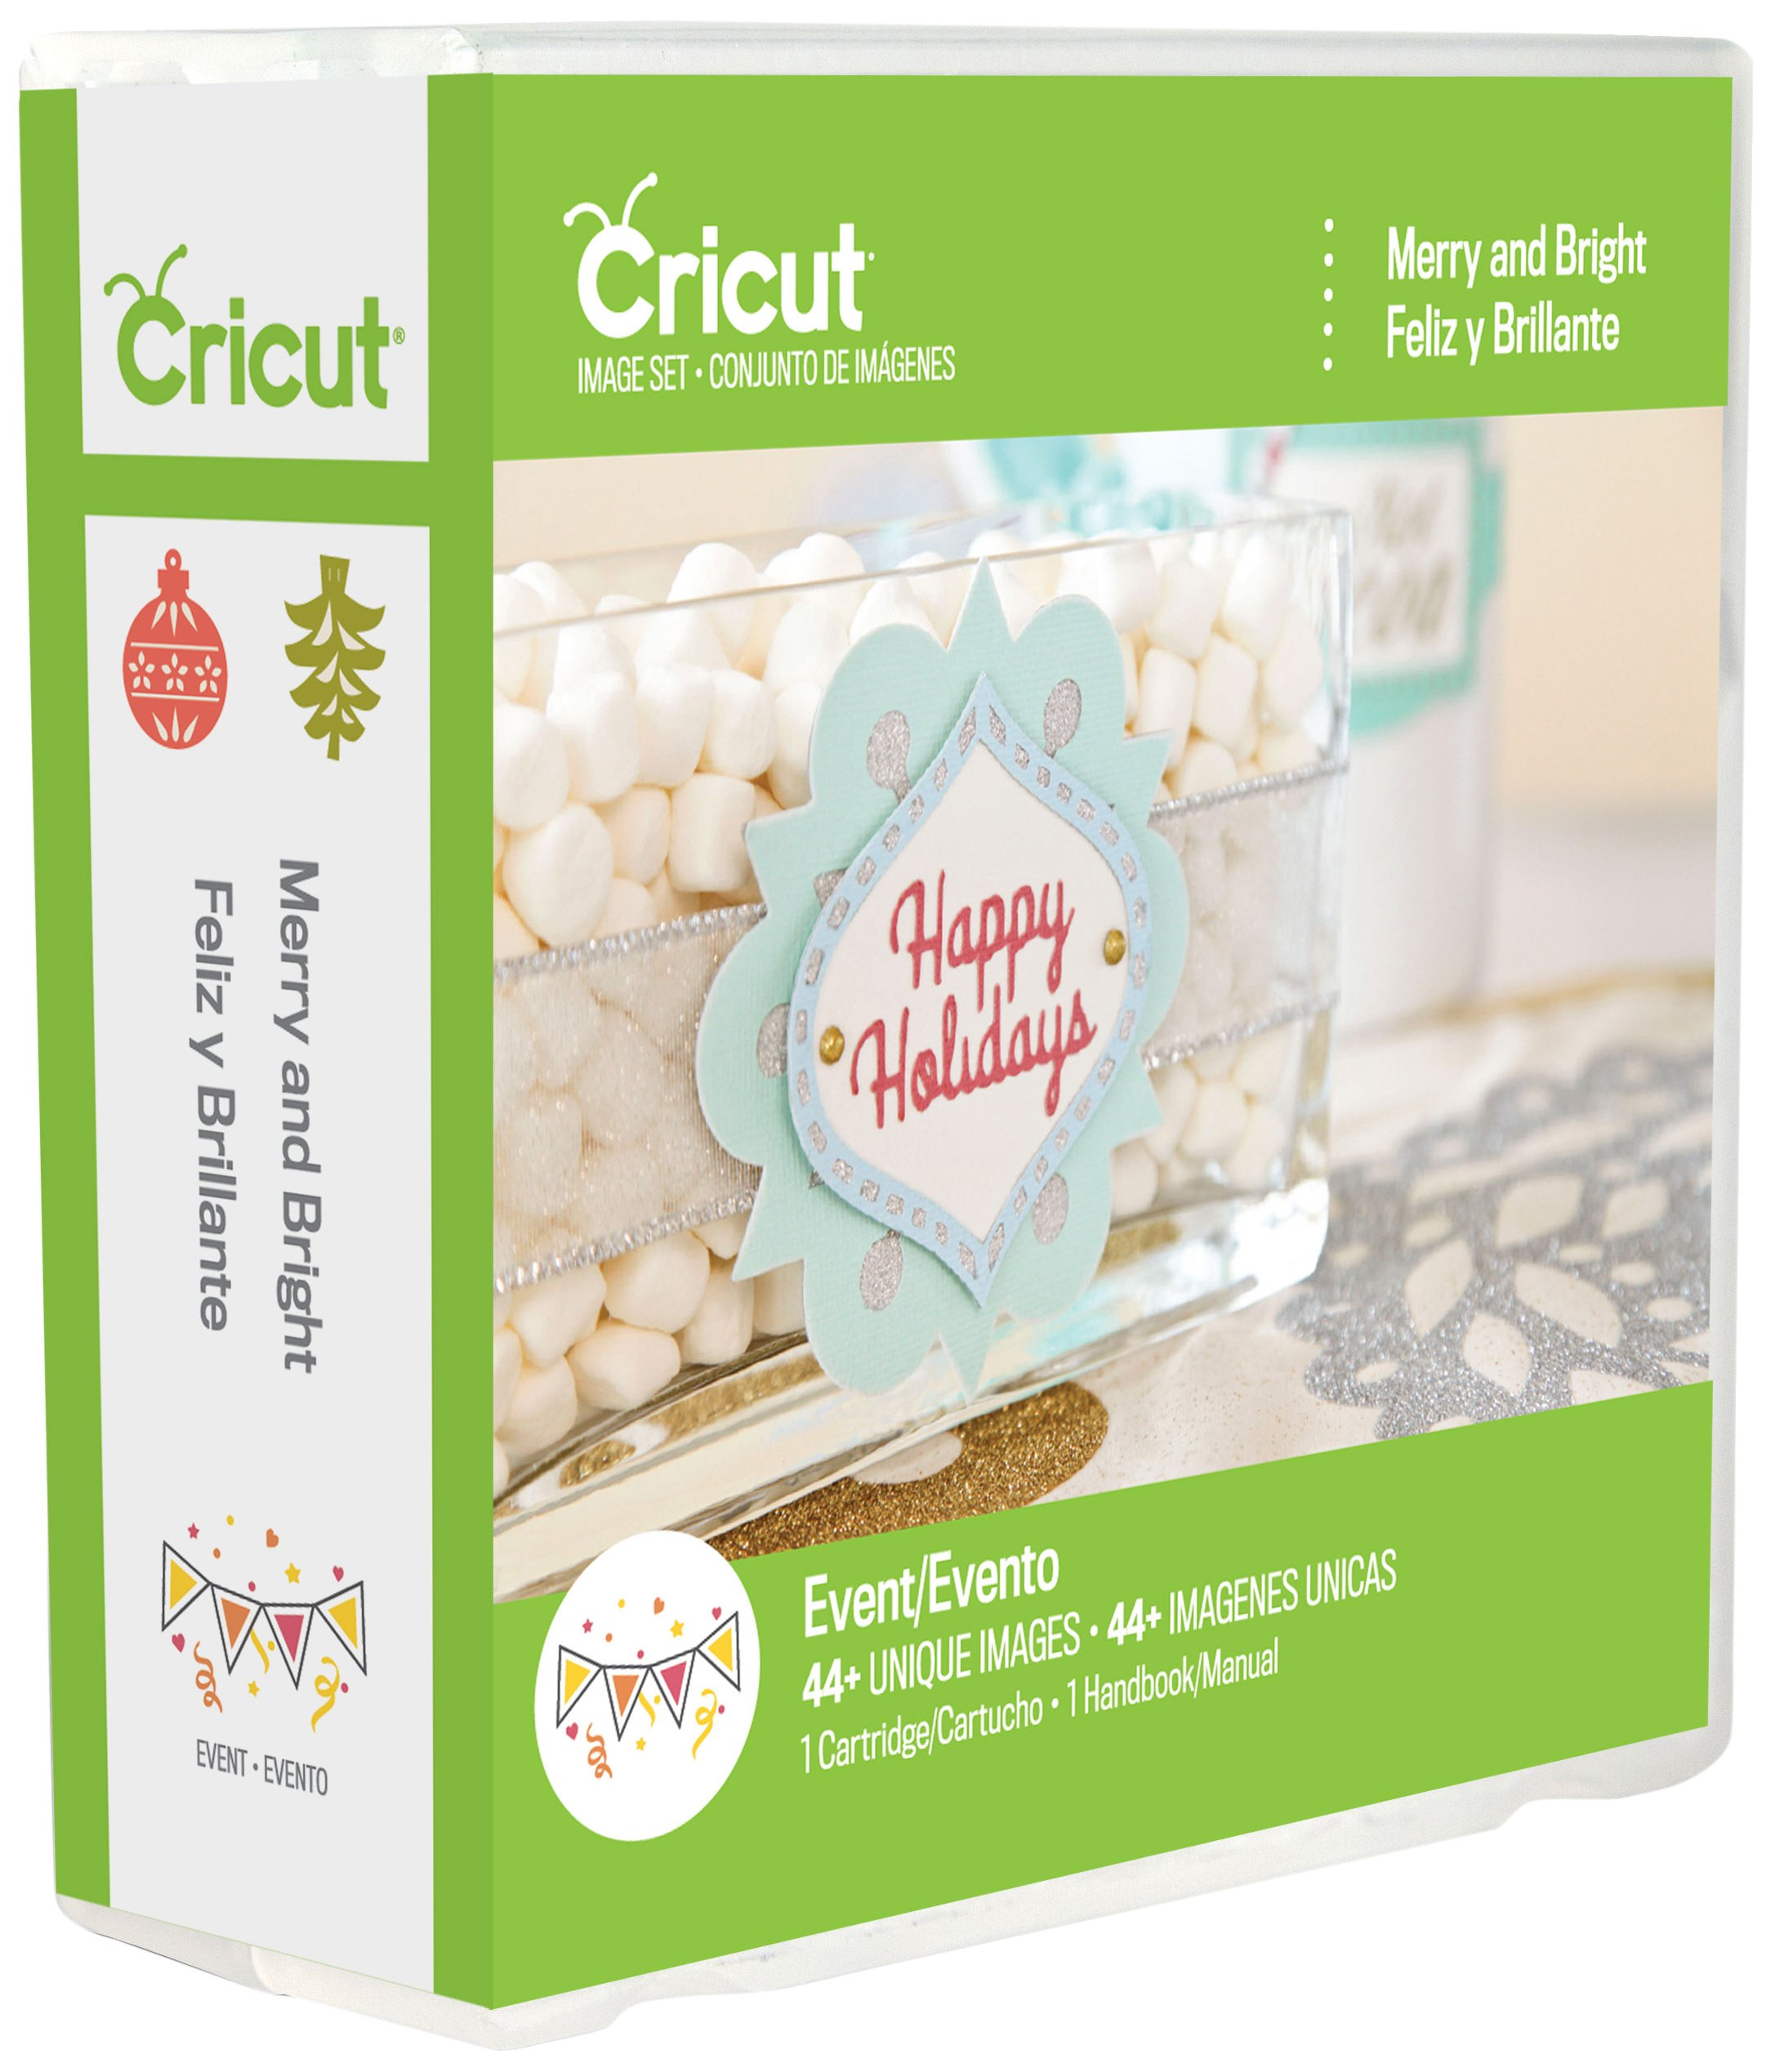 Cricut Merry and Bright cartridge